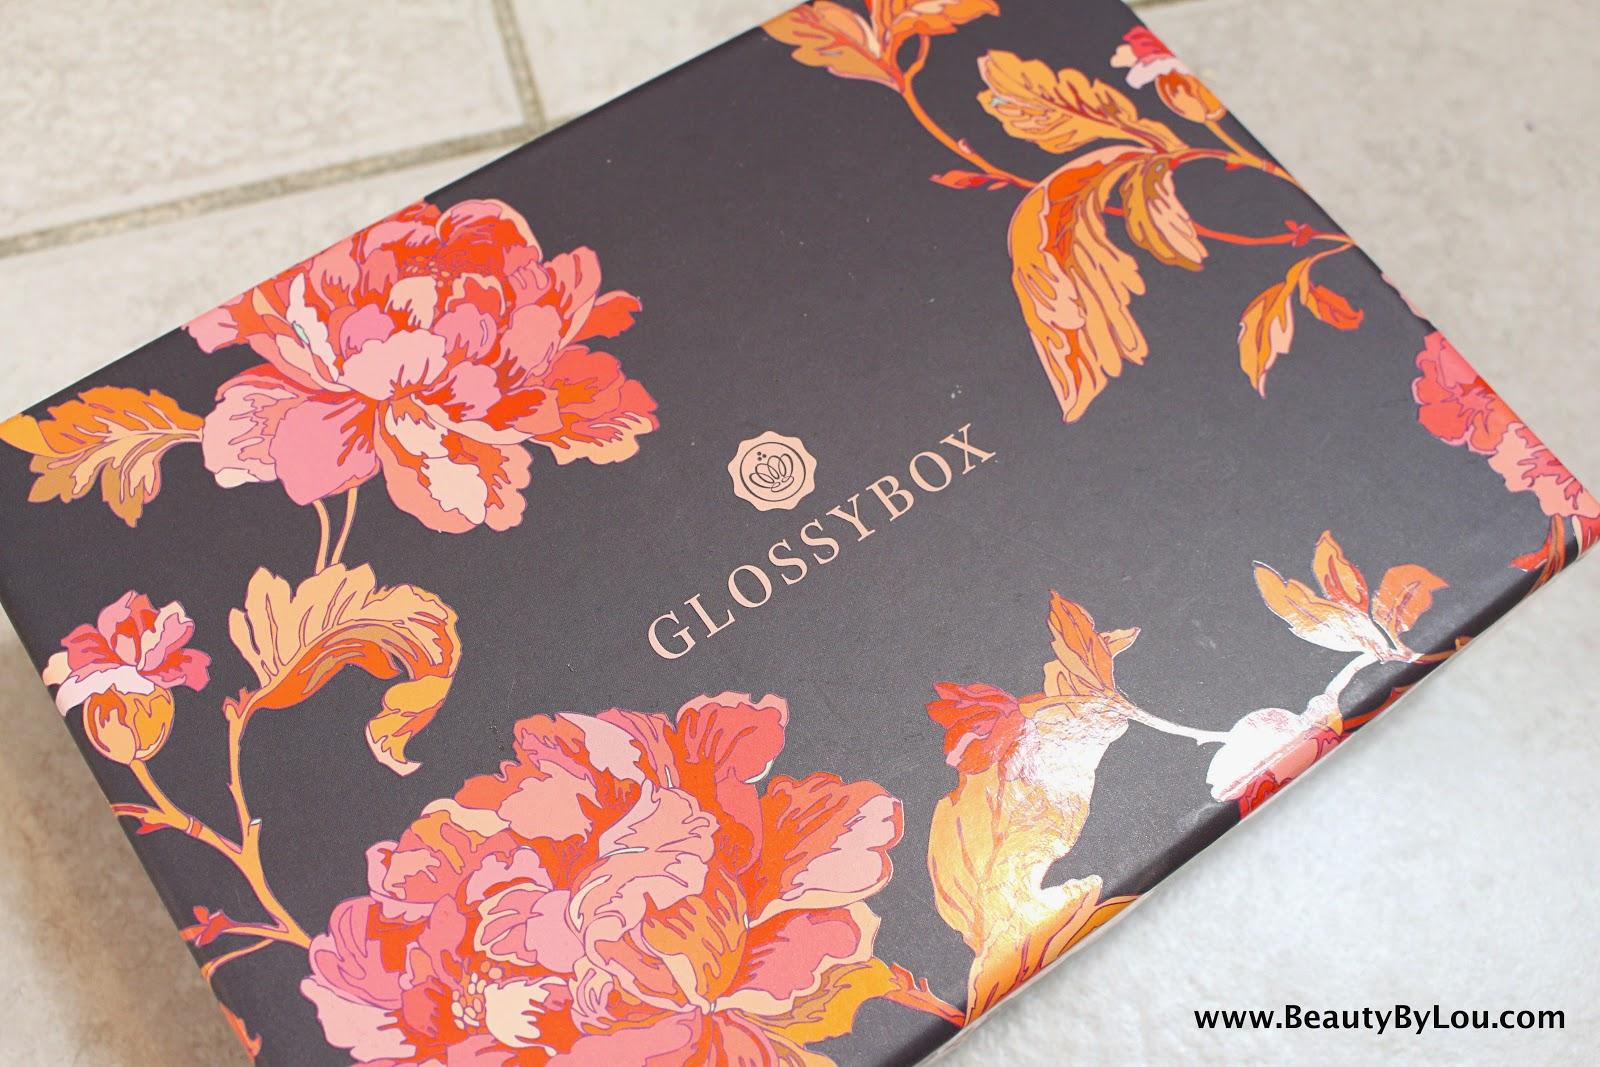 http://www.beautybylou.com/2014/10/glossybox-octobre-bilan-mitige.html